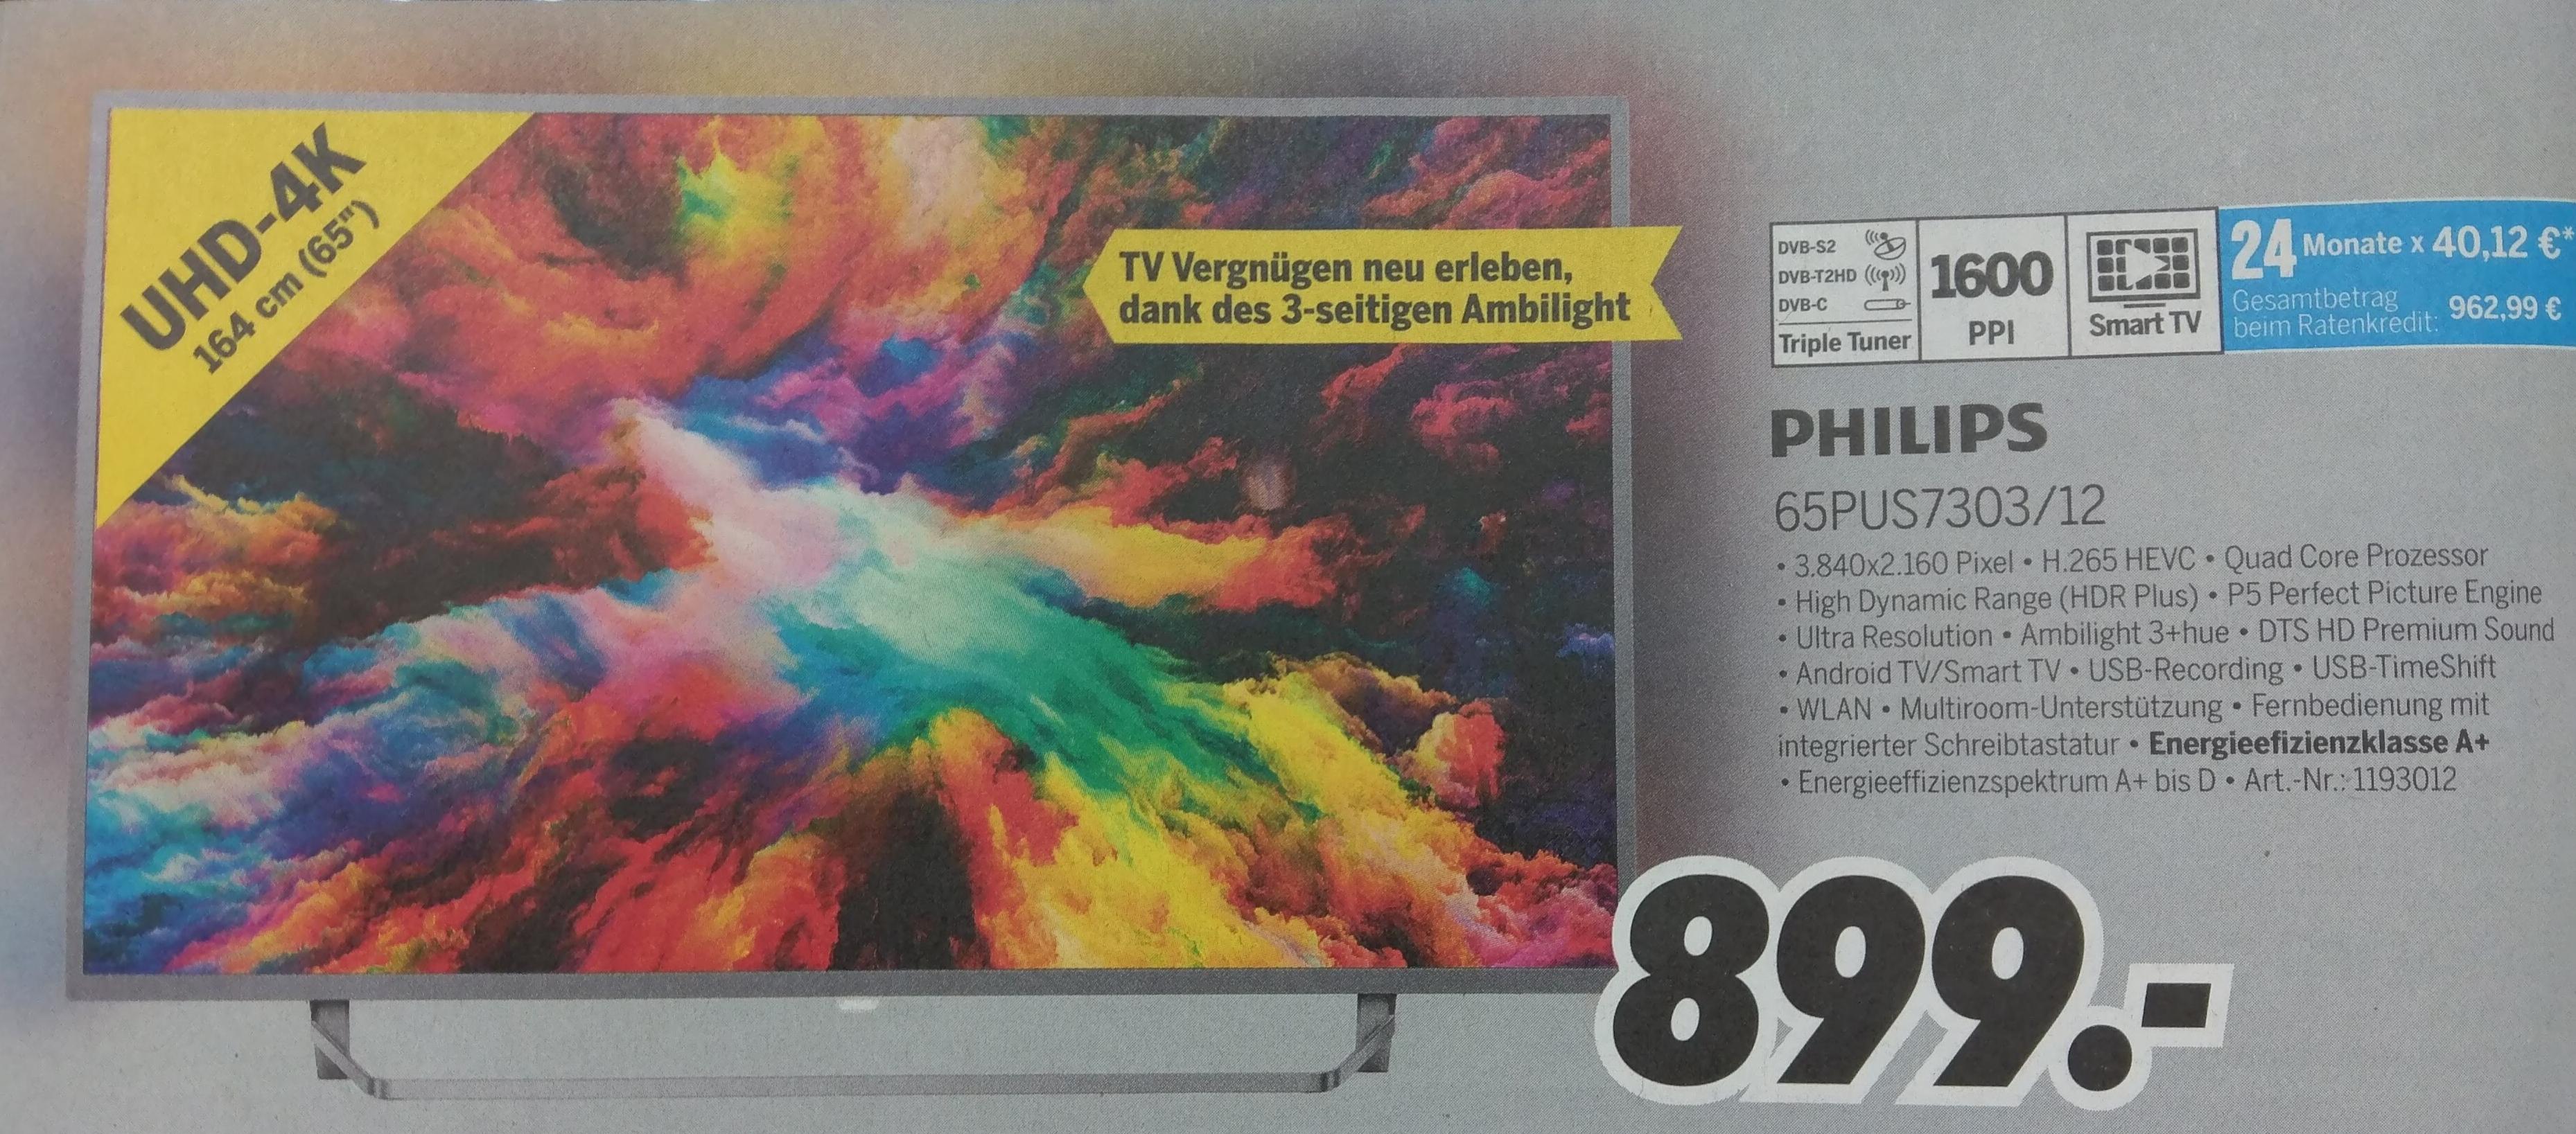 MEDIMAX Philips 65pus7303/12 TV 65 Zoll 4K Ambilight 3seitig